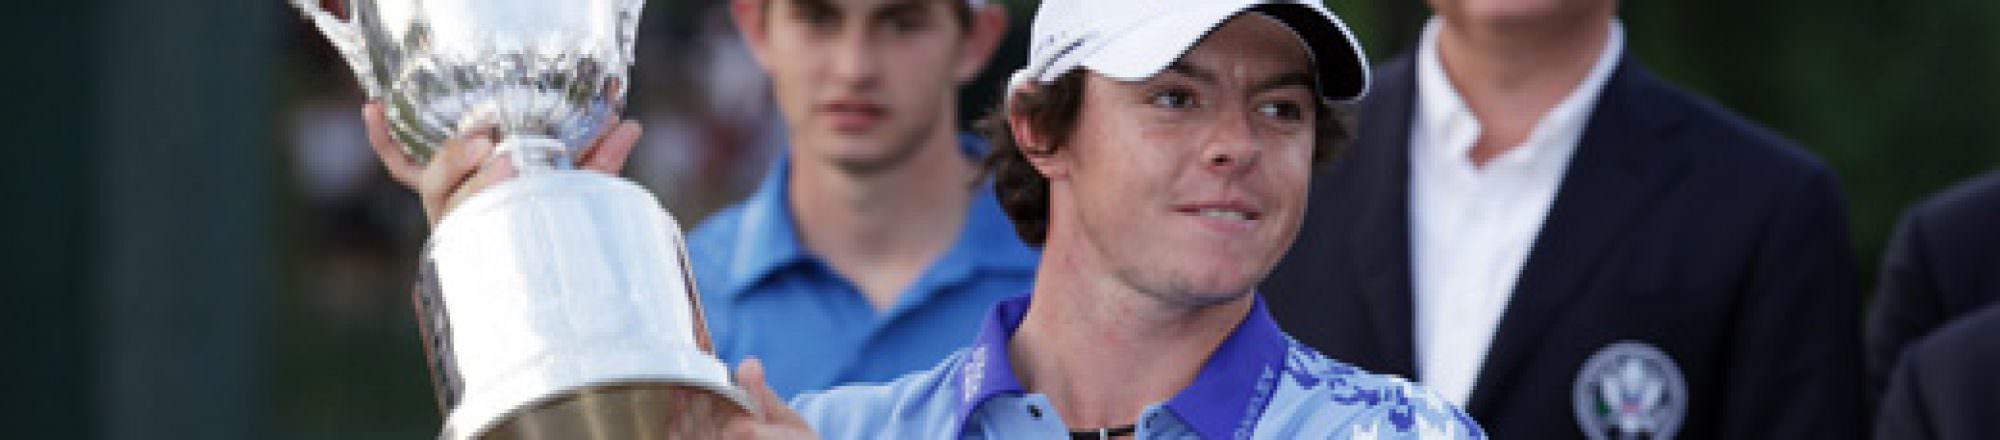 US Open 2011 - the analysis